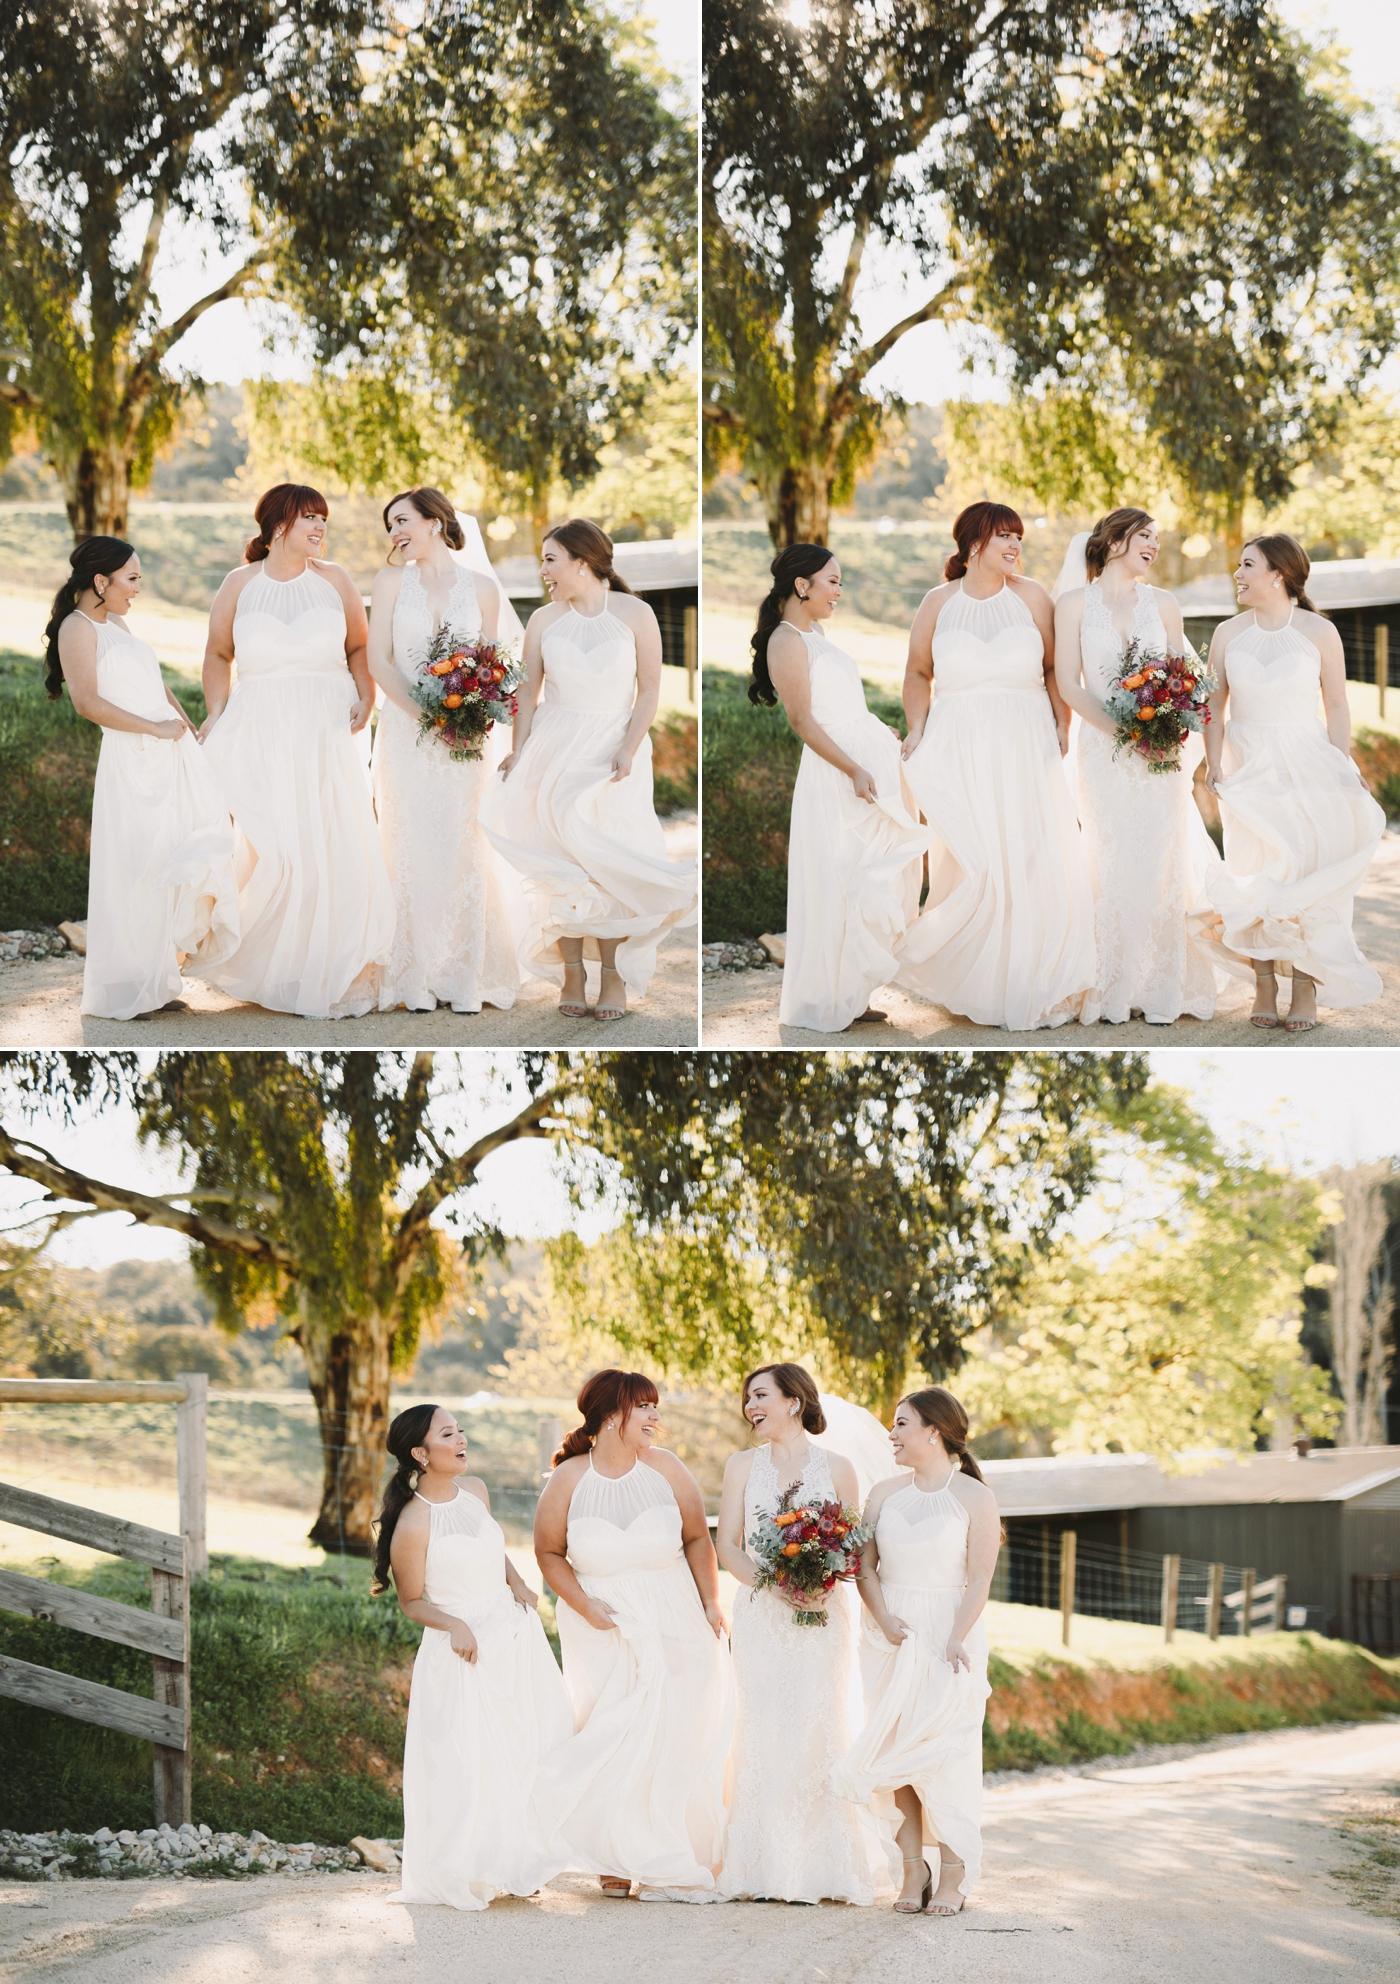 Erin & Ryan - Natural Wedding Photographer in Adelaide - Maximillians Wedding - Simple and Modern Wedding Photographer - Katherine Schultz - www.katherineschultzphotography.com_0039.jpg